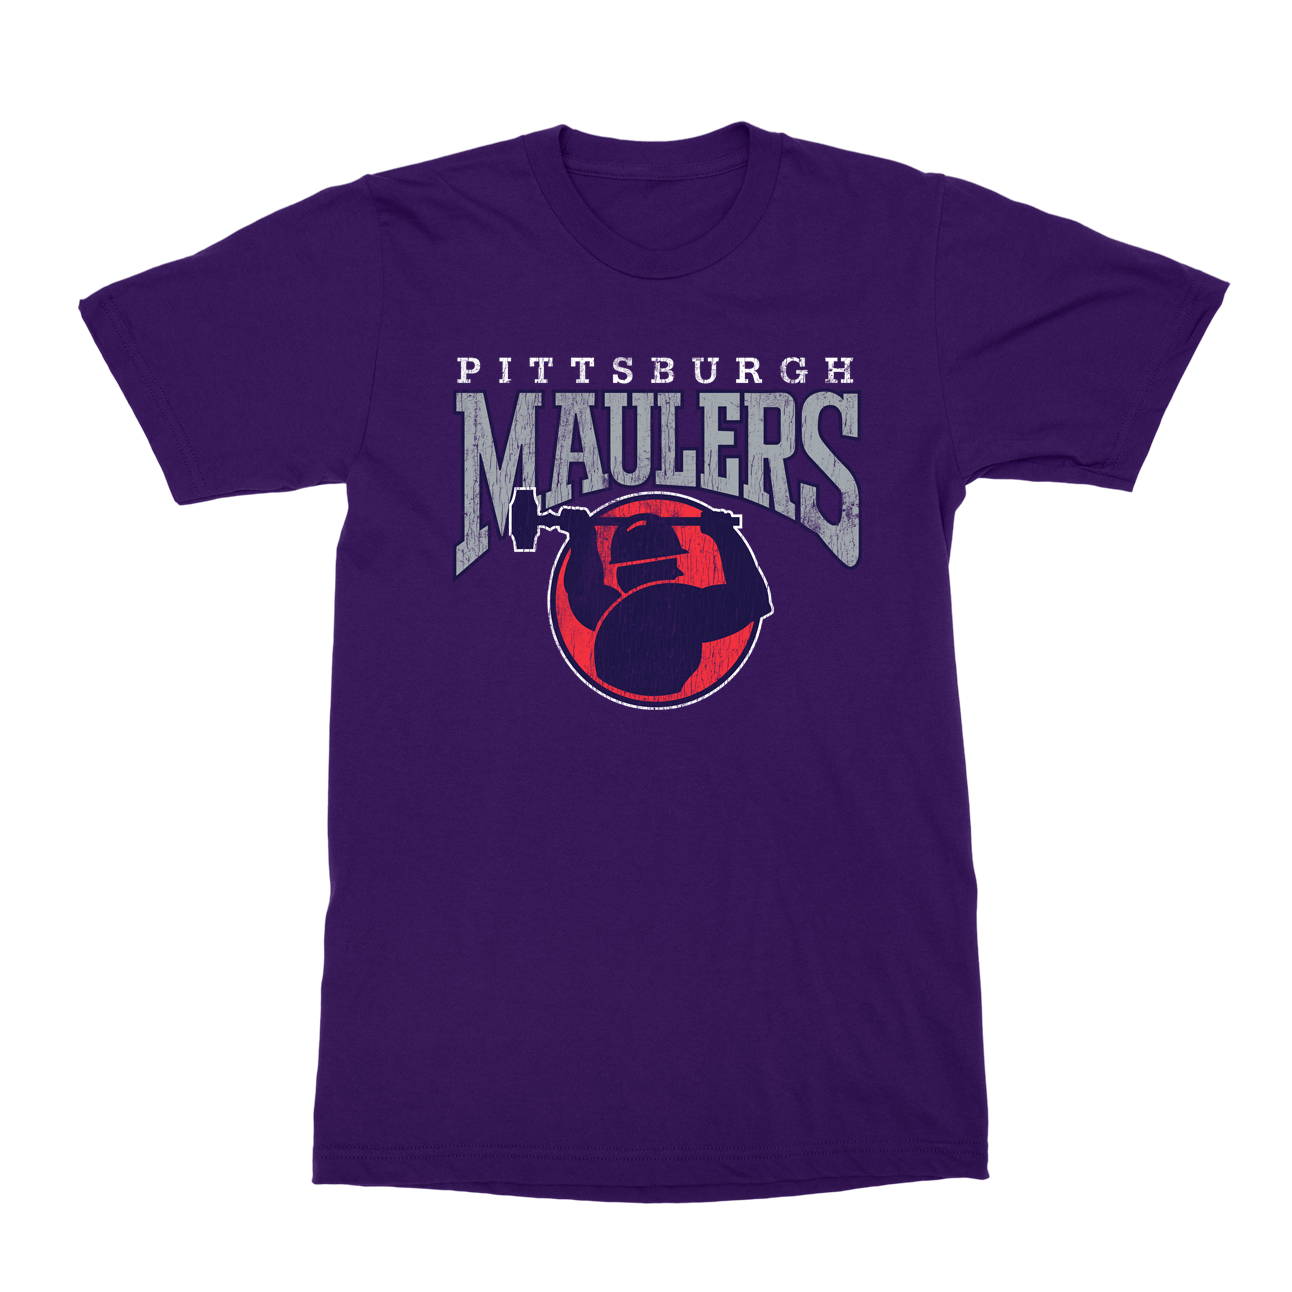 Pittsburgh Maulers T-Shirt